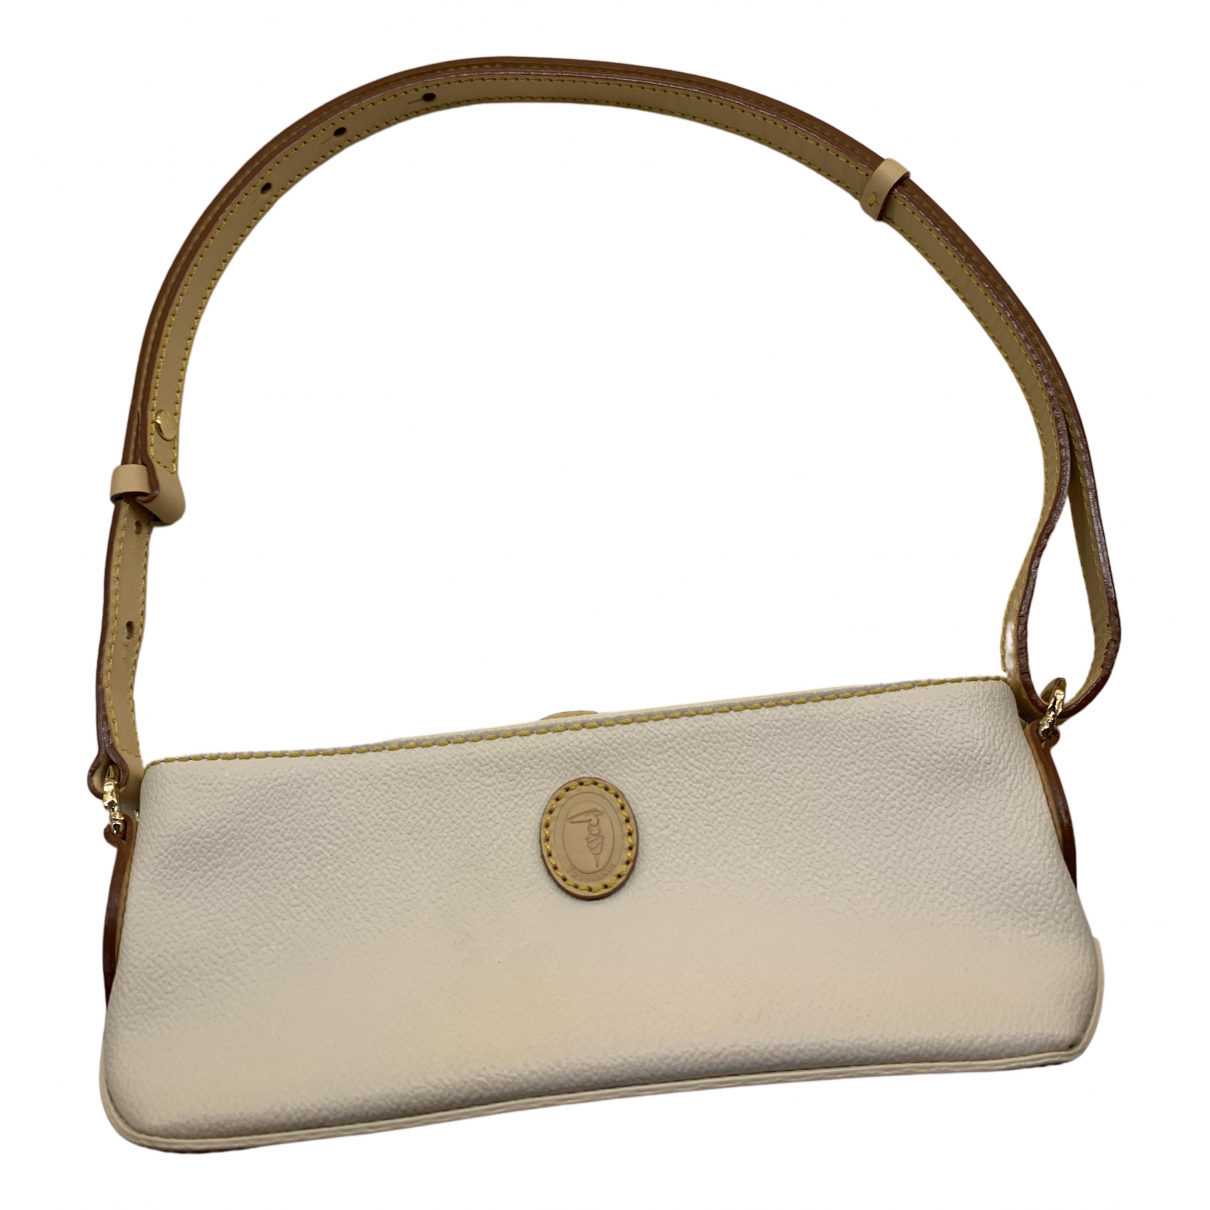 Trussardi N Beige Leather handbag for Women N